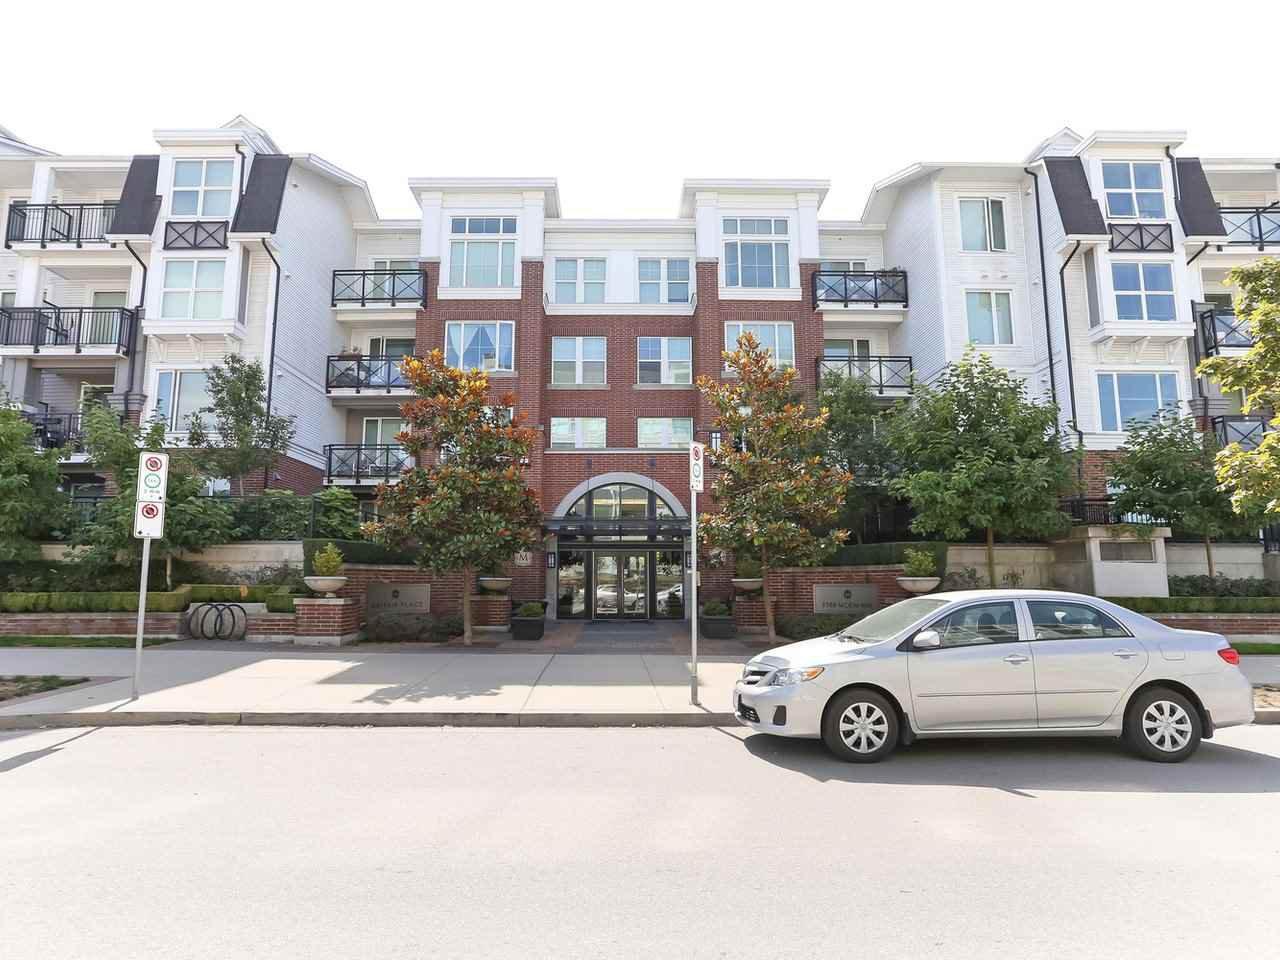 "Main Photo: 403 9388 MCKIM Way in Richmond: West Cambie Condo for sale in ""MAYFAIR"" : MLS®# R2403538"